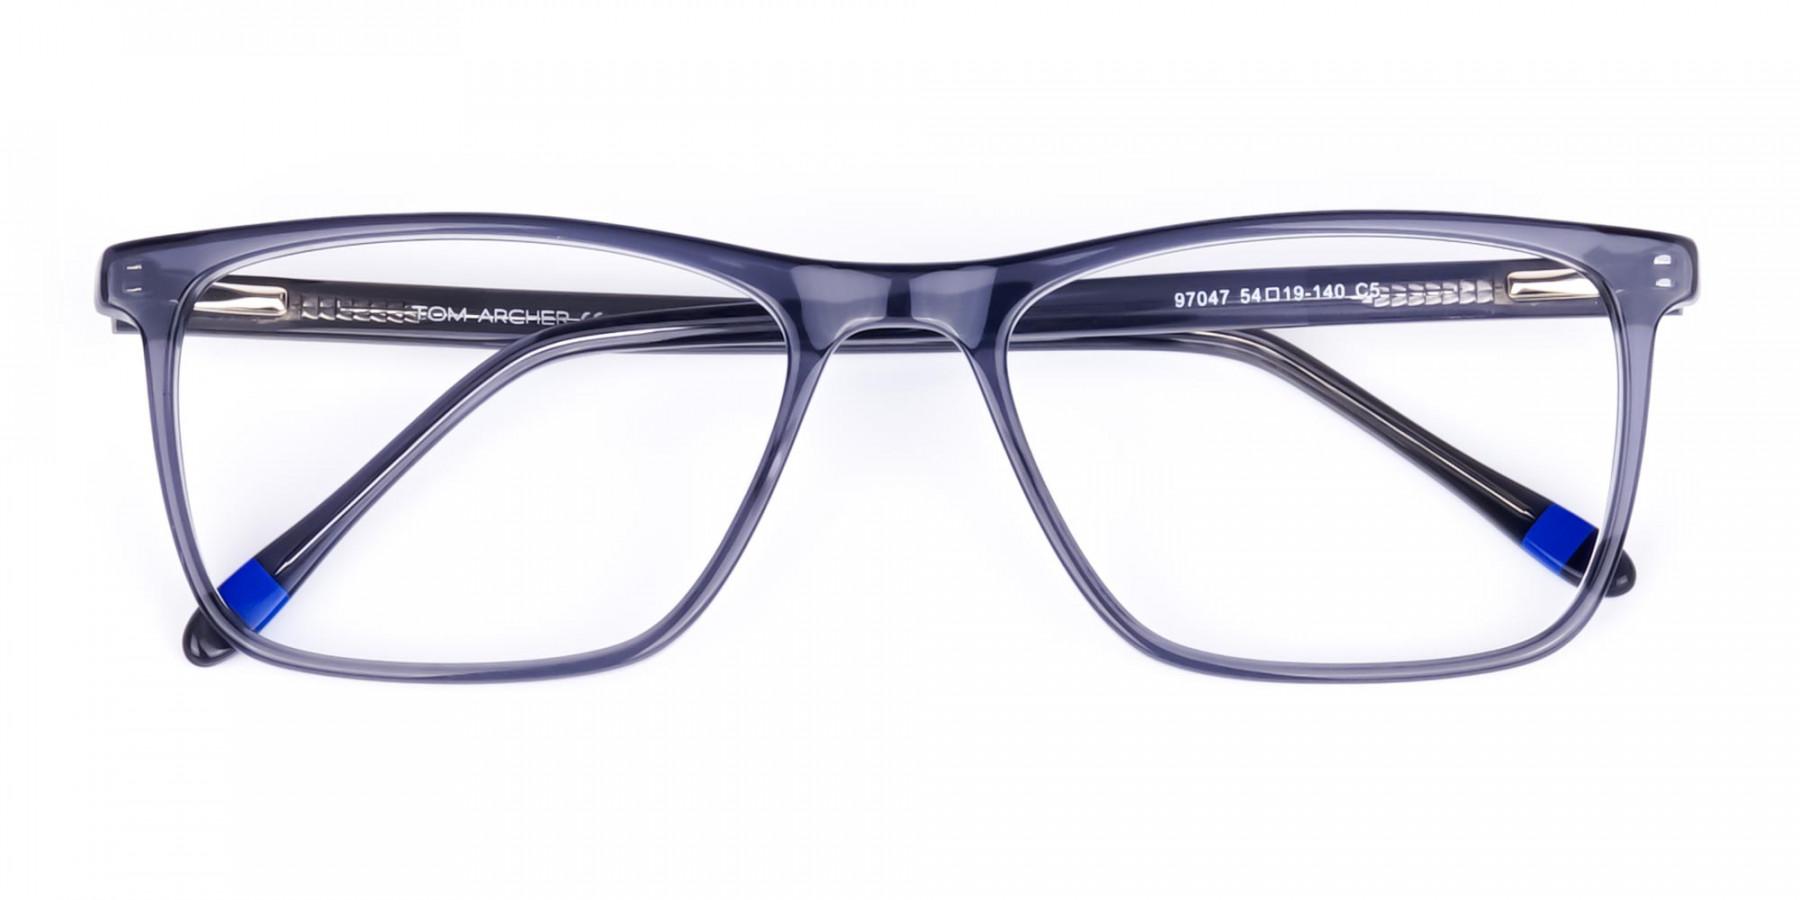 Dusty-Grey-Rectangular-Full-Rim-Glasses-1